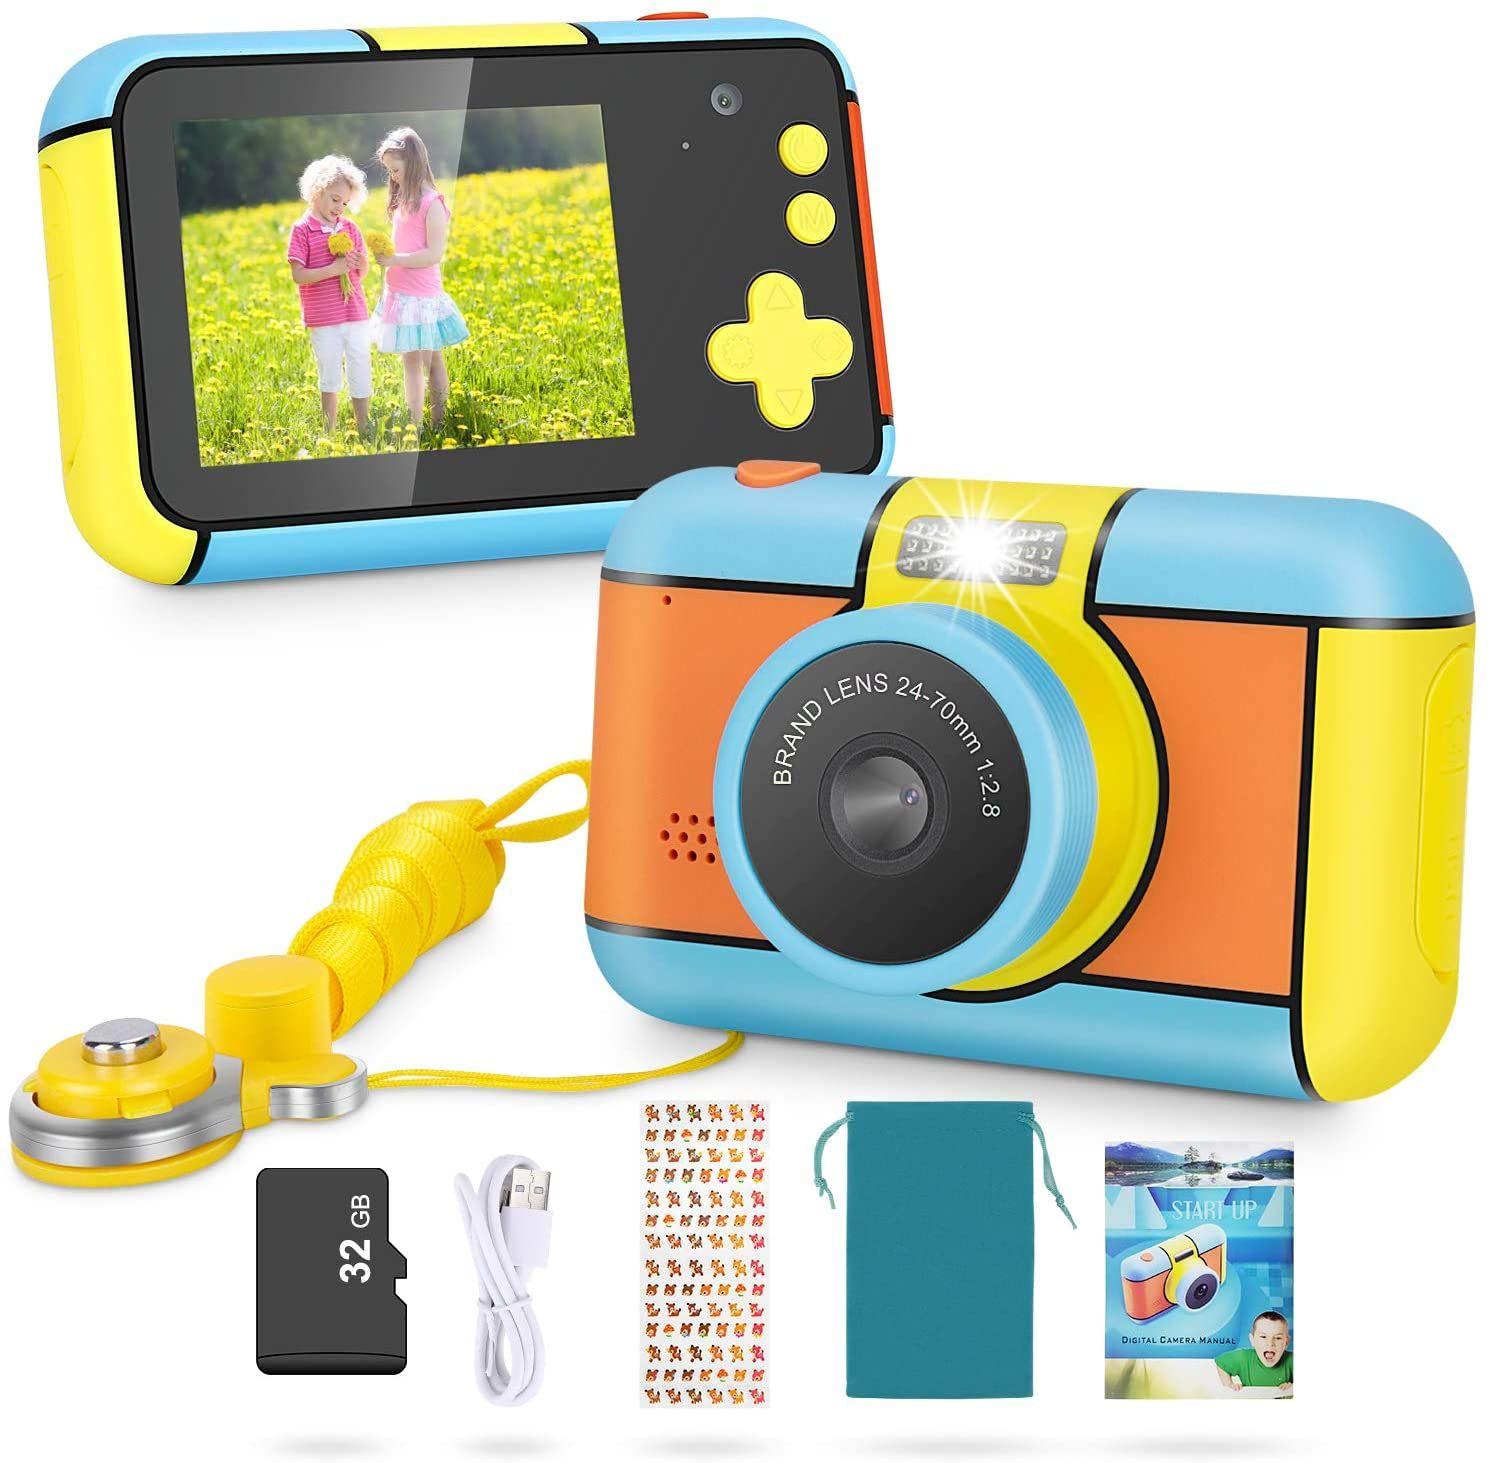 Magicfun Instant Print Camera for Kids Zero Ink Camera with Paper ...